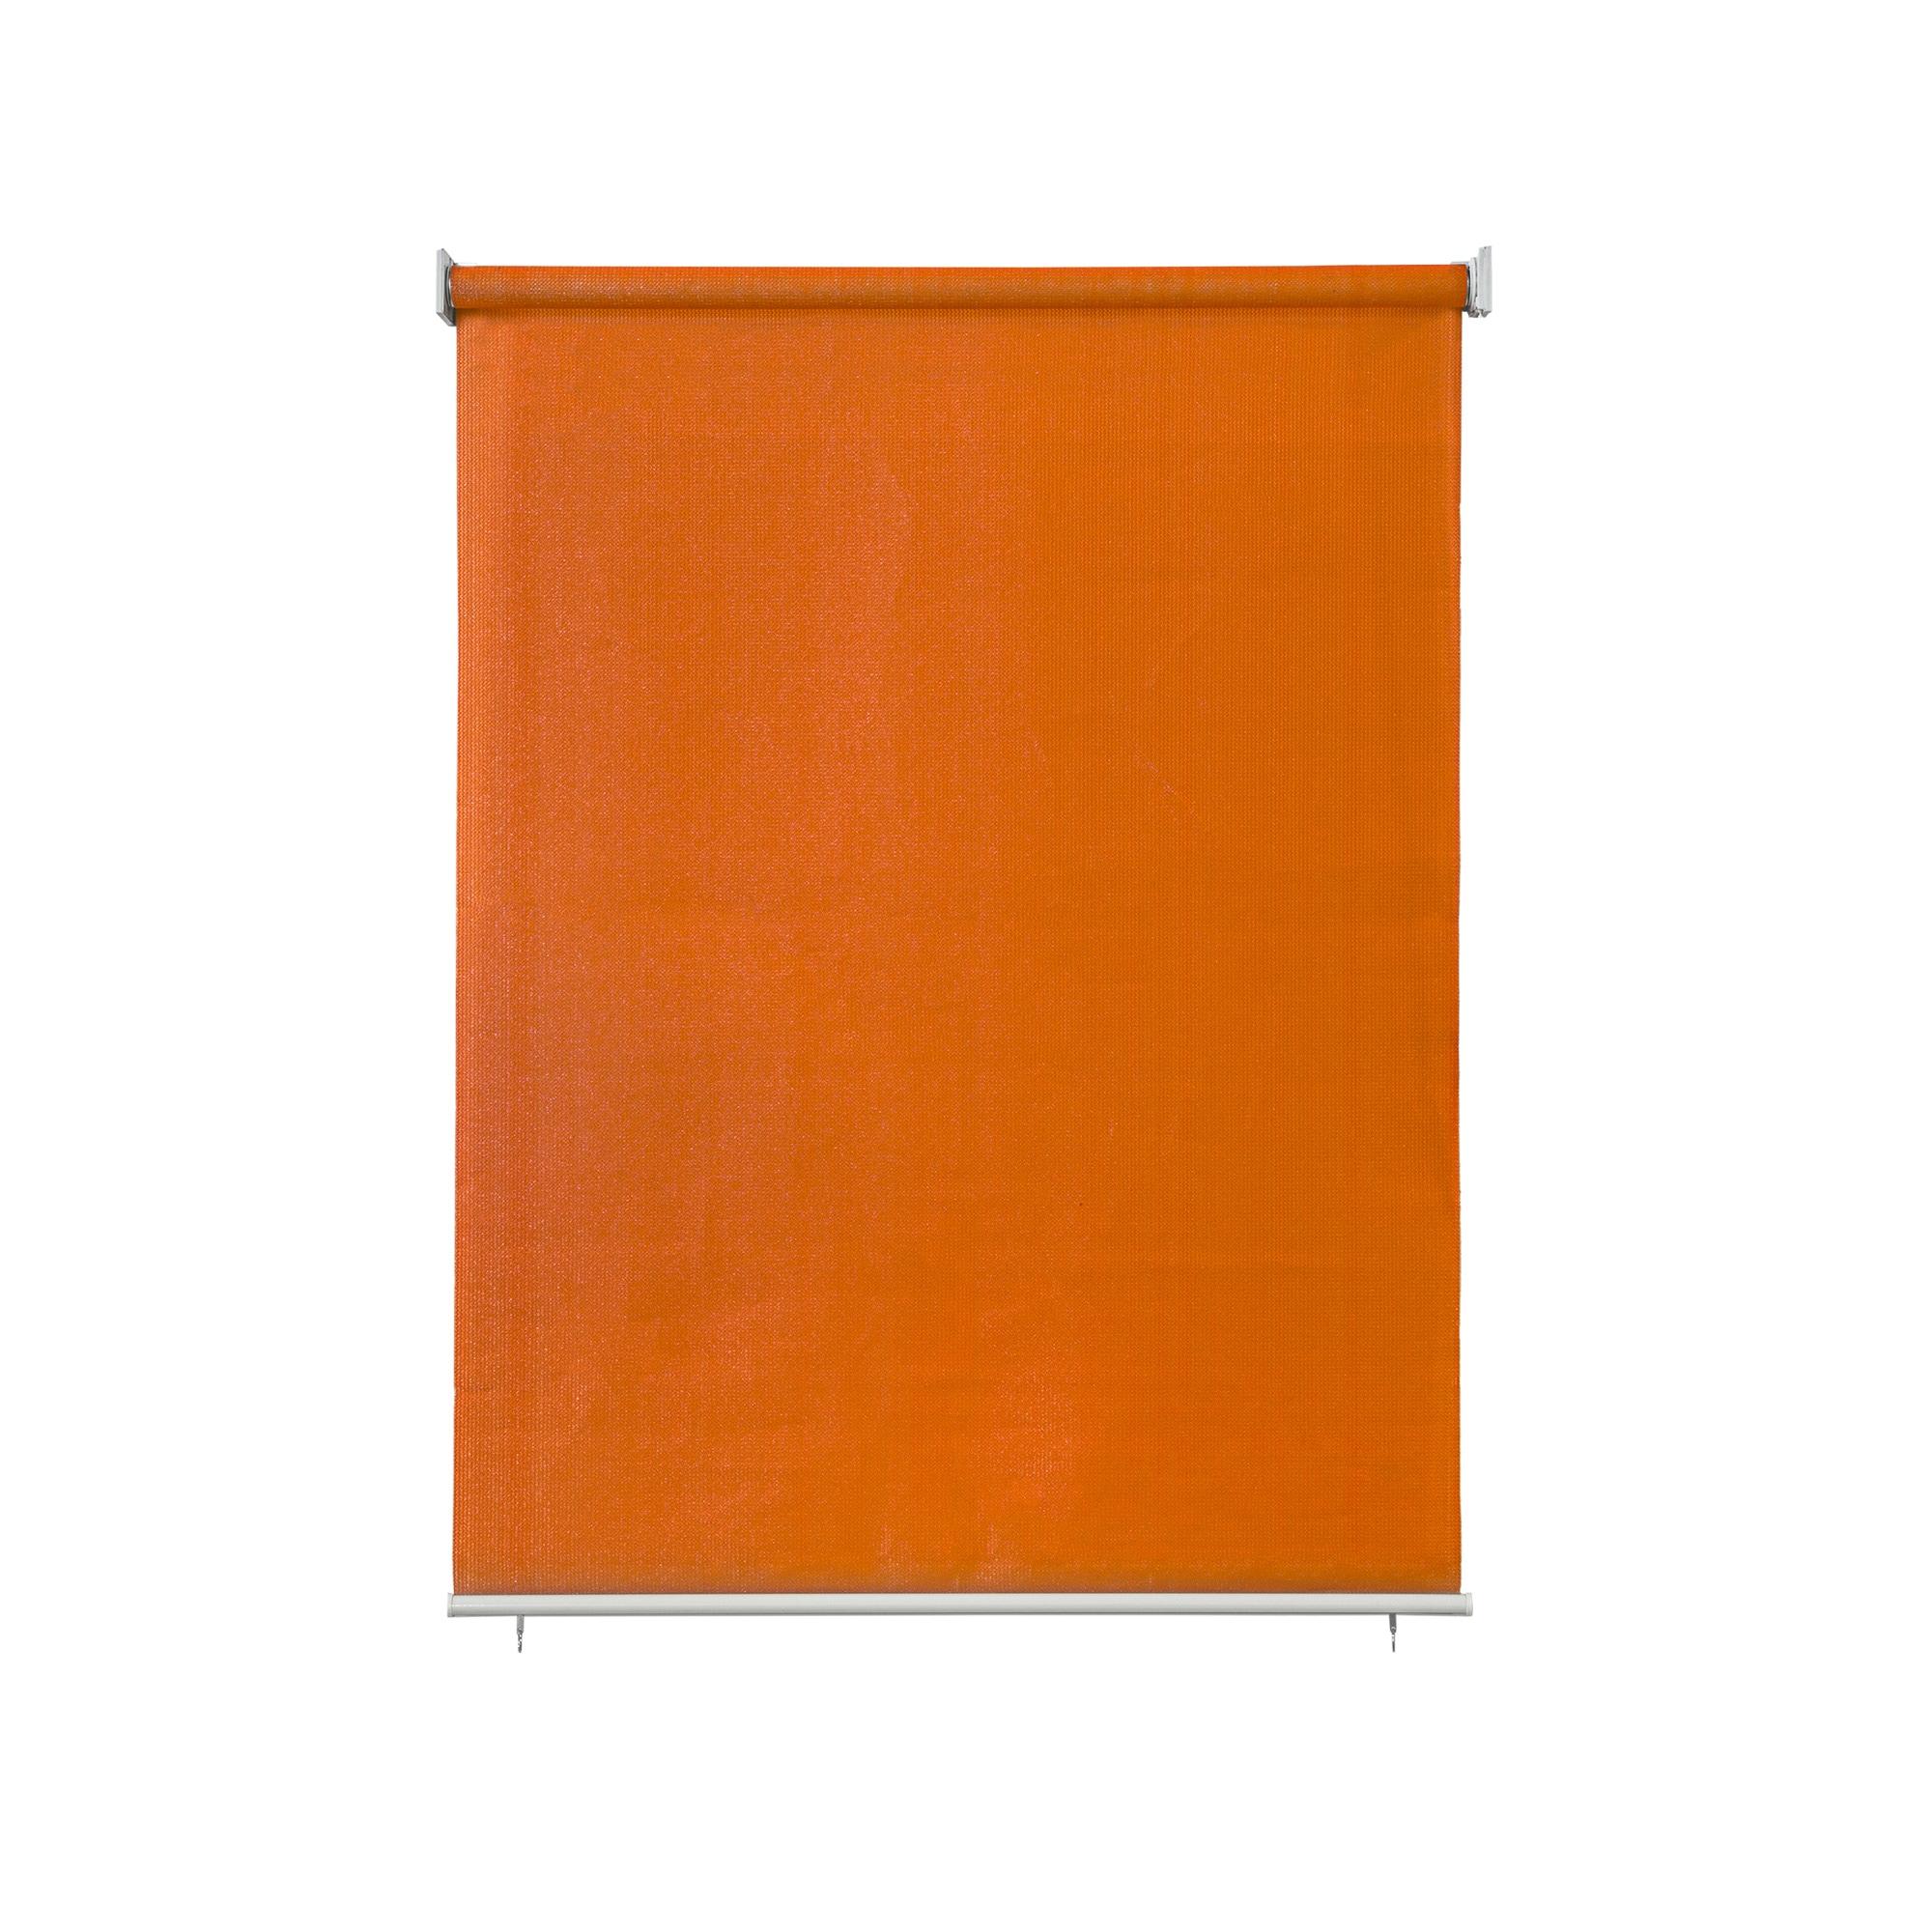 au enrollo rollo sichtschutz balkon windschutz fenster markise senkrechtmarkise ebay. Black Bedroom Furniture Sets. Home Design Ideas